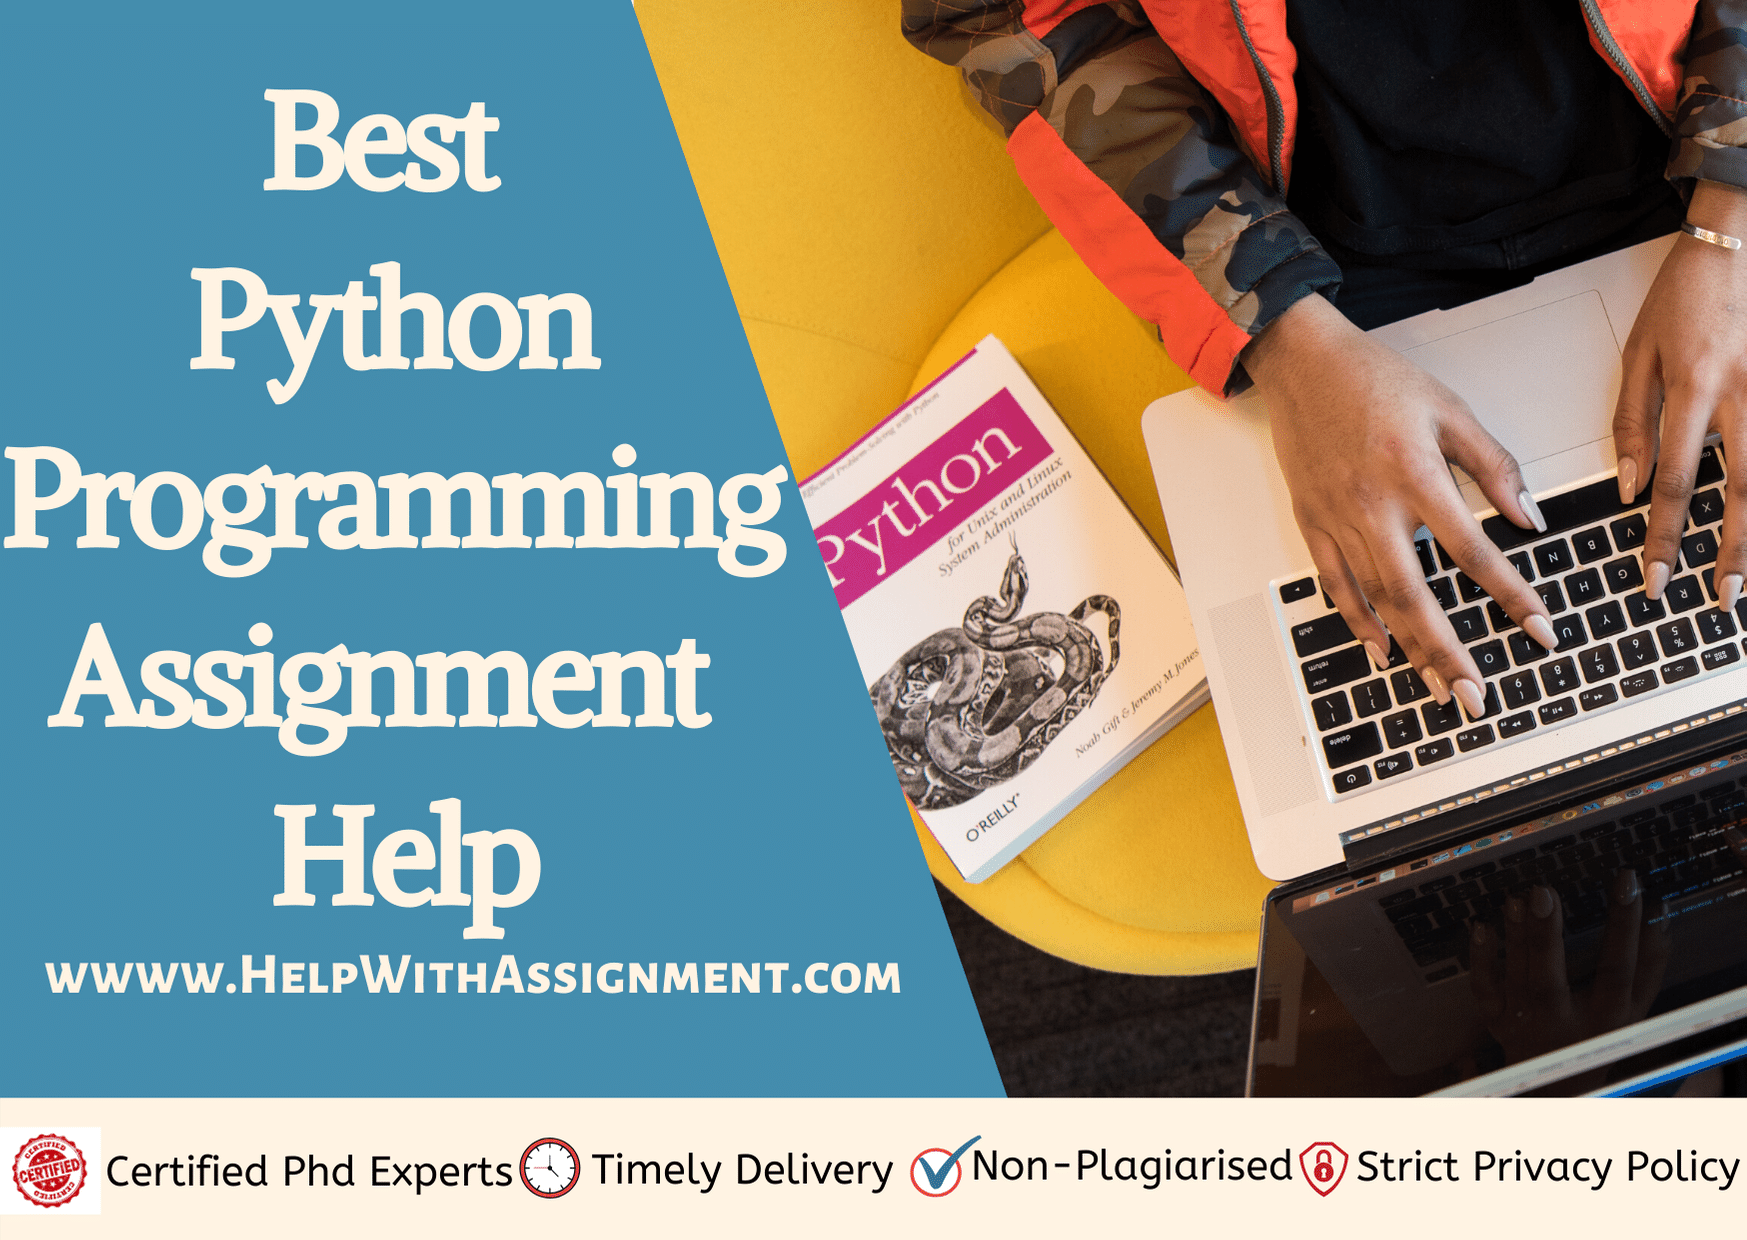 Python Programming Assignment Help